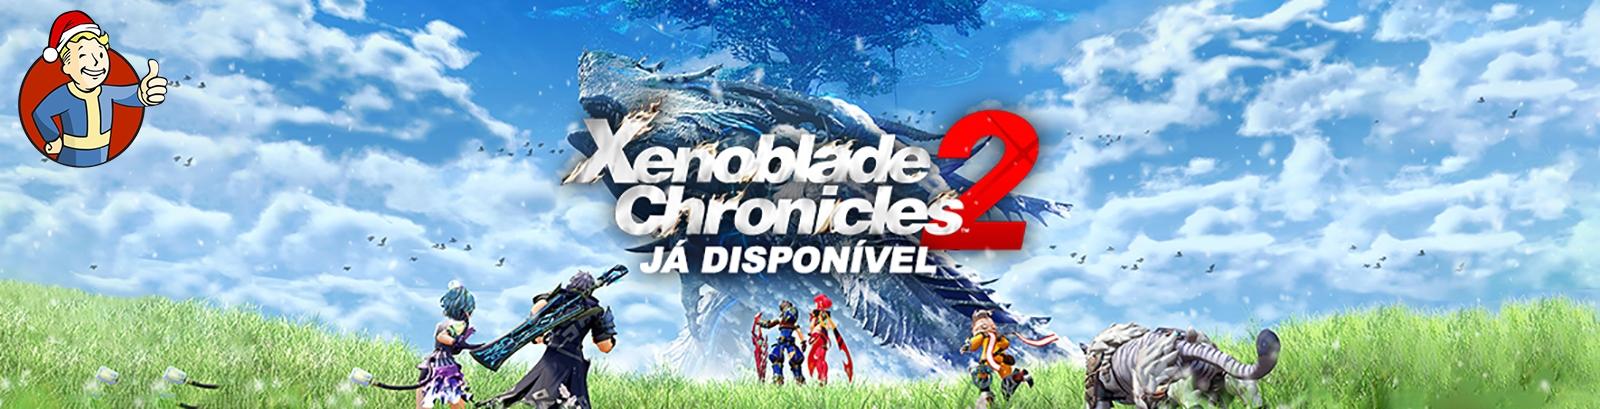 Xenoblade Chronicles 2 - Já Dipsonível